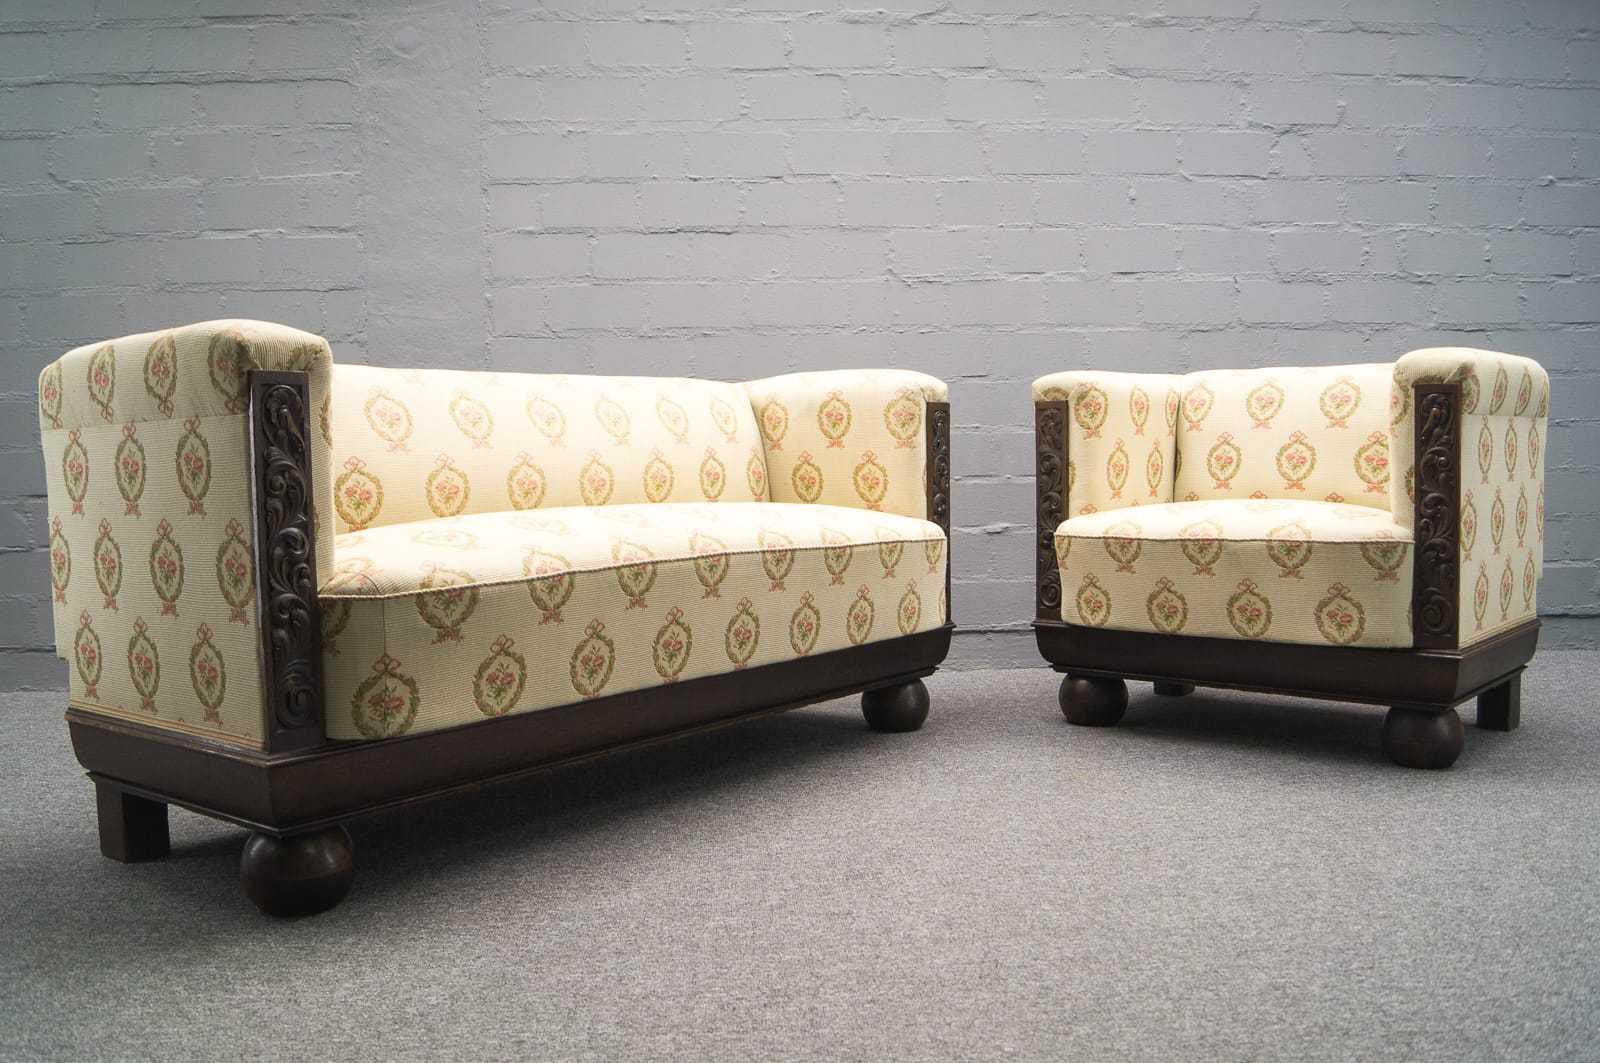 art deco sofagarnitur sofa sessel kubisch bauhaus kubus. Black Bedroom Furniture Sets. Home Design Ideas